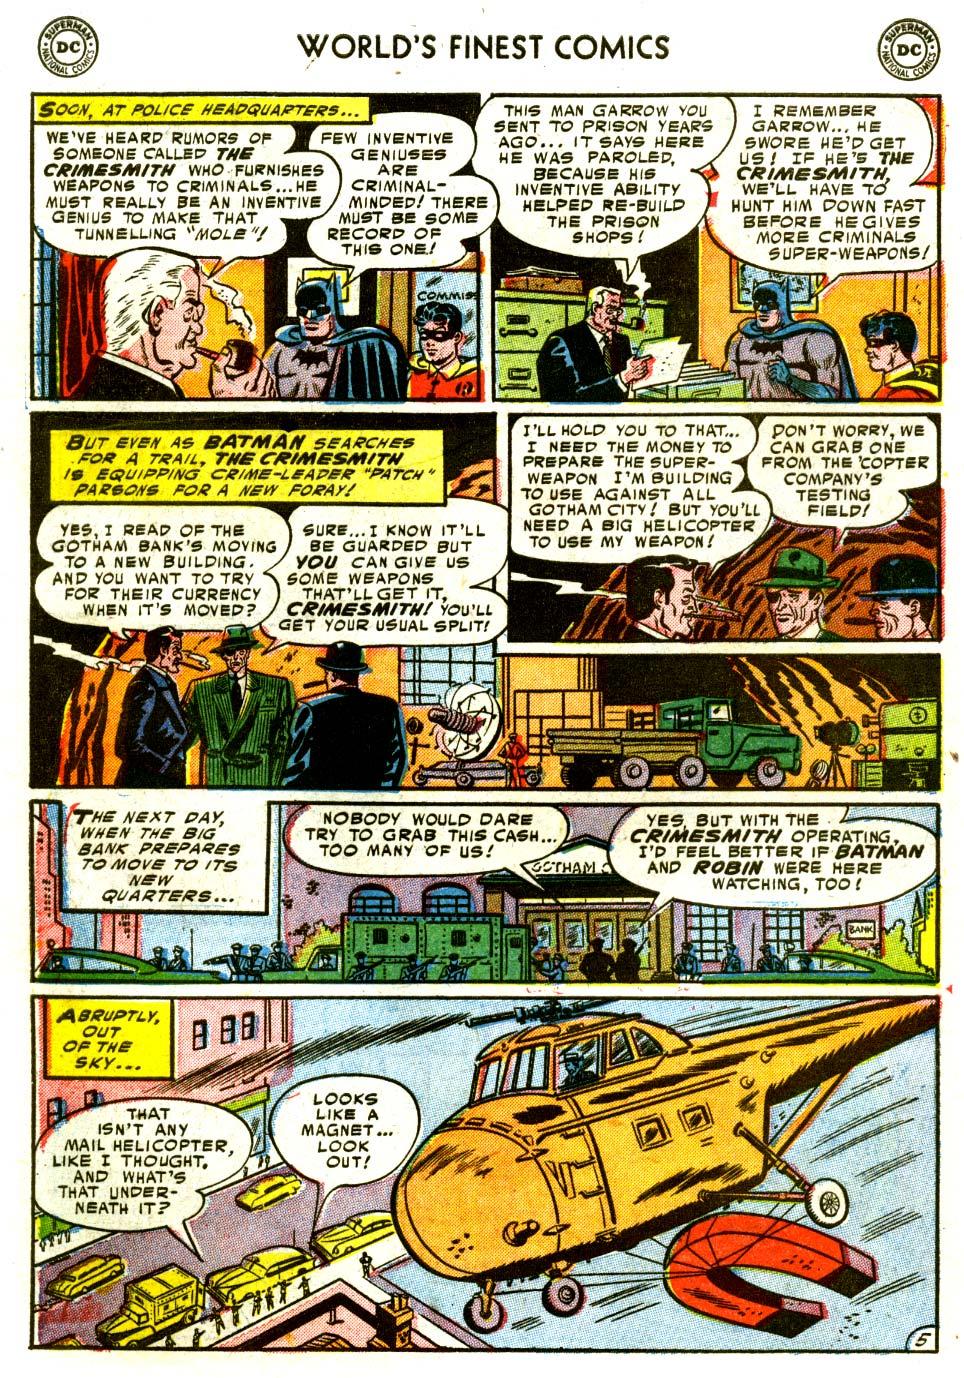 Read online World's Finest Comics comic -  Issue #68 - 58